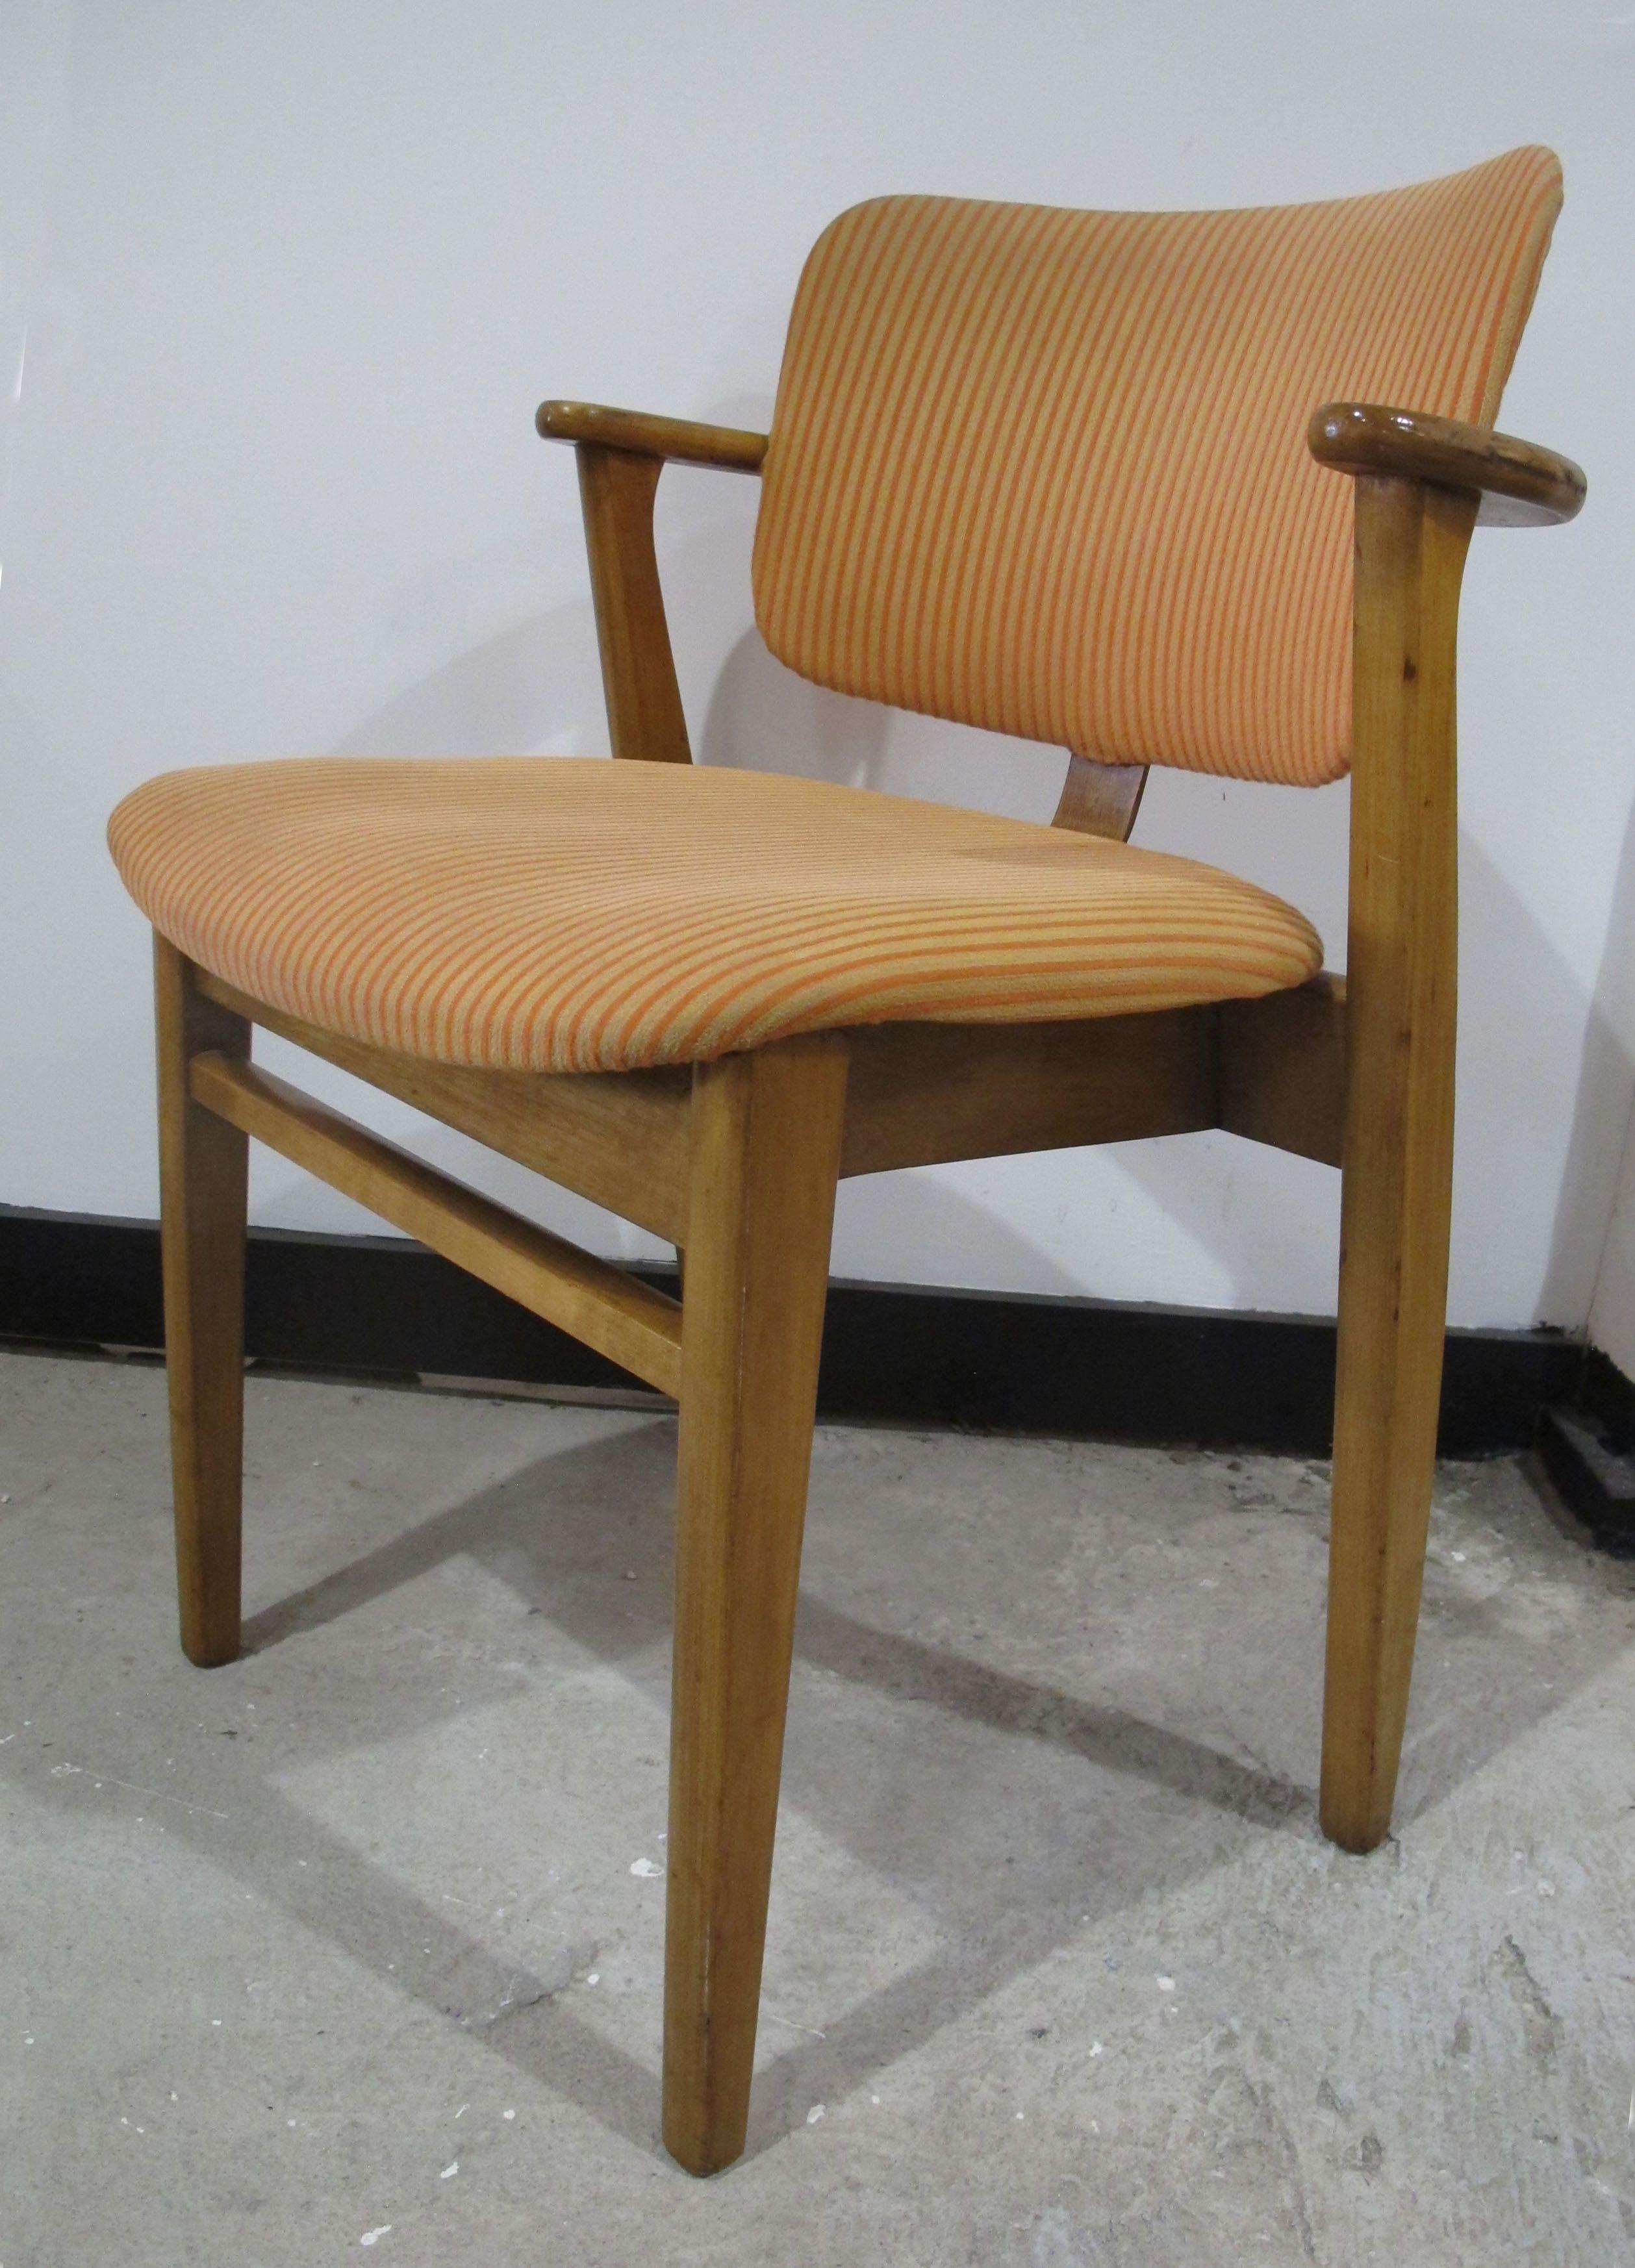 early ilmari tapiovaara domus chair by knoll model 142 c 1947 rh pinterest com Modern Chairs Black Leather Lounge Chair